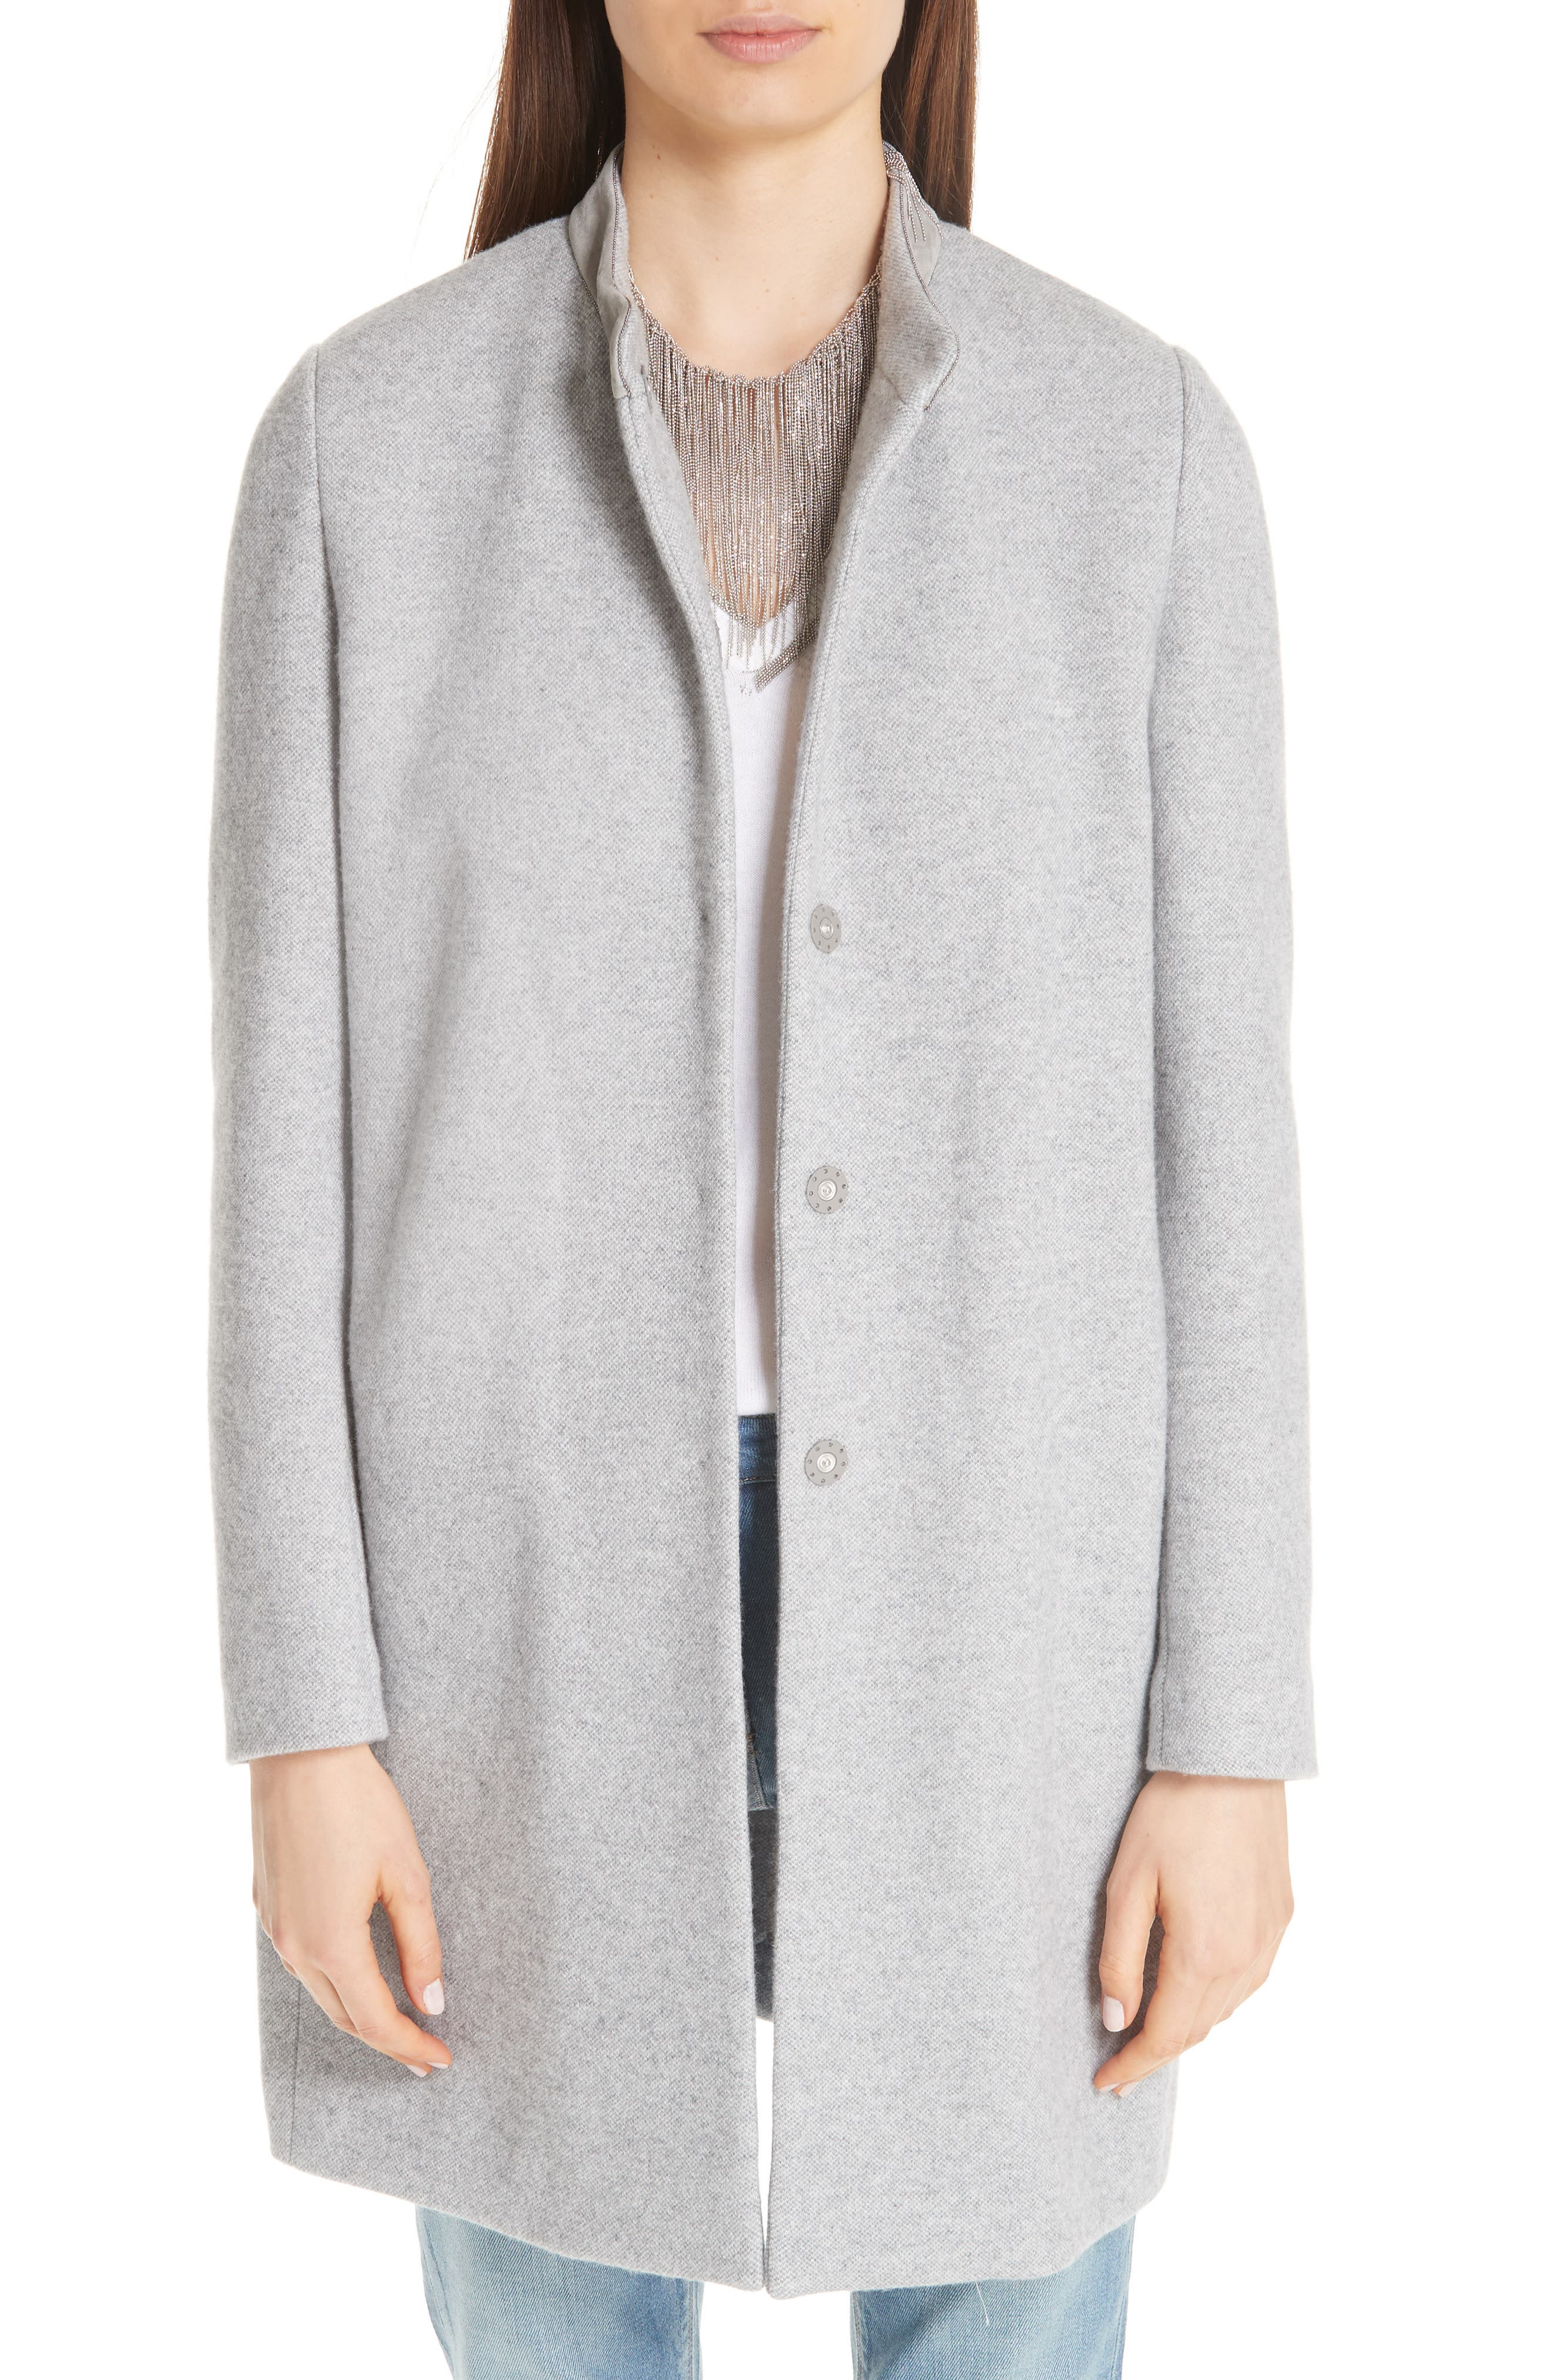 FABIANA FILIPPI,                             Suede Trim Tweed Jacket,                             Main thumbnail 1, color,                             GREY